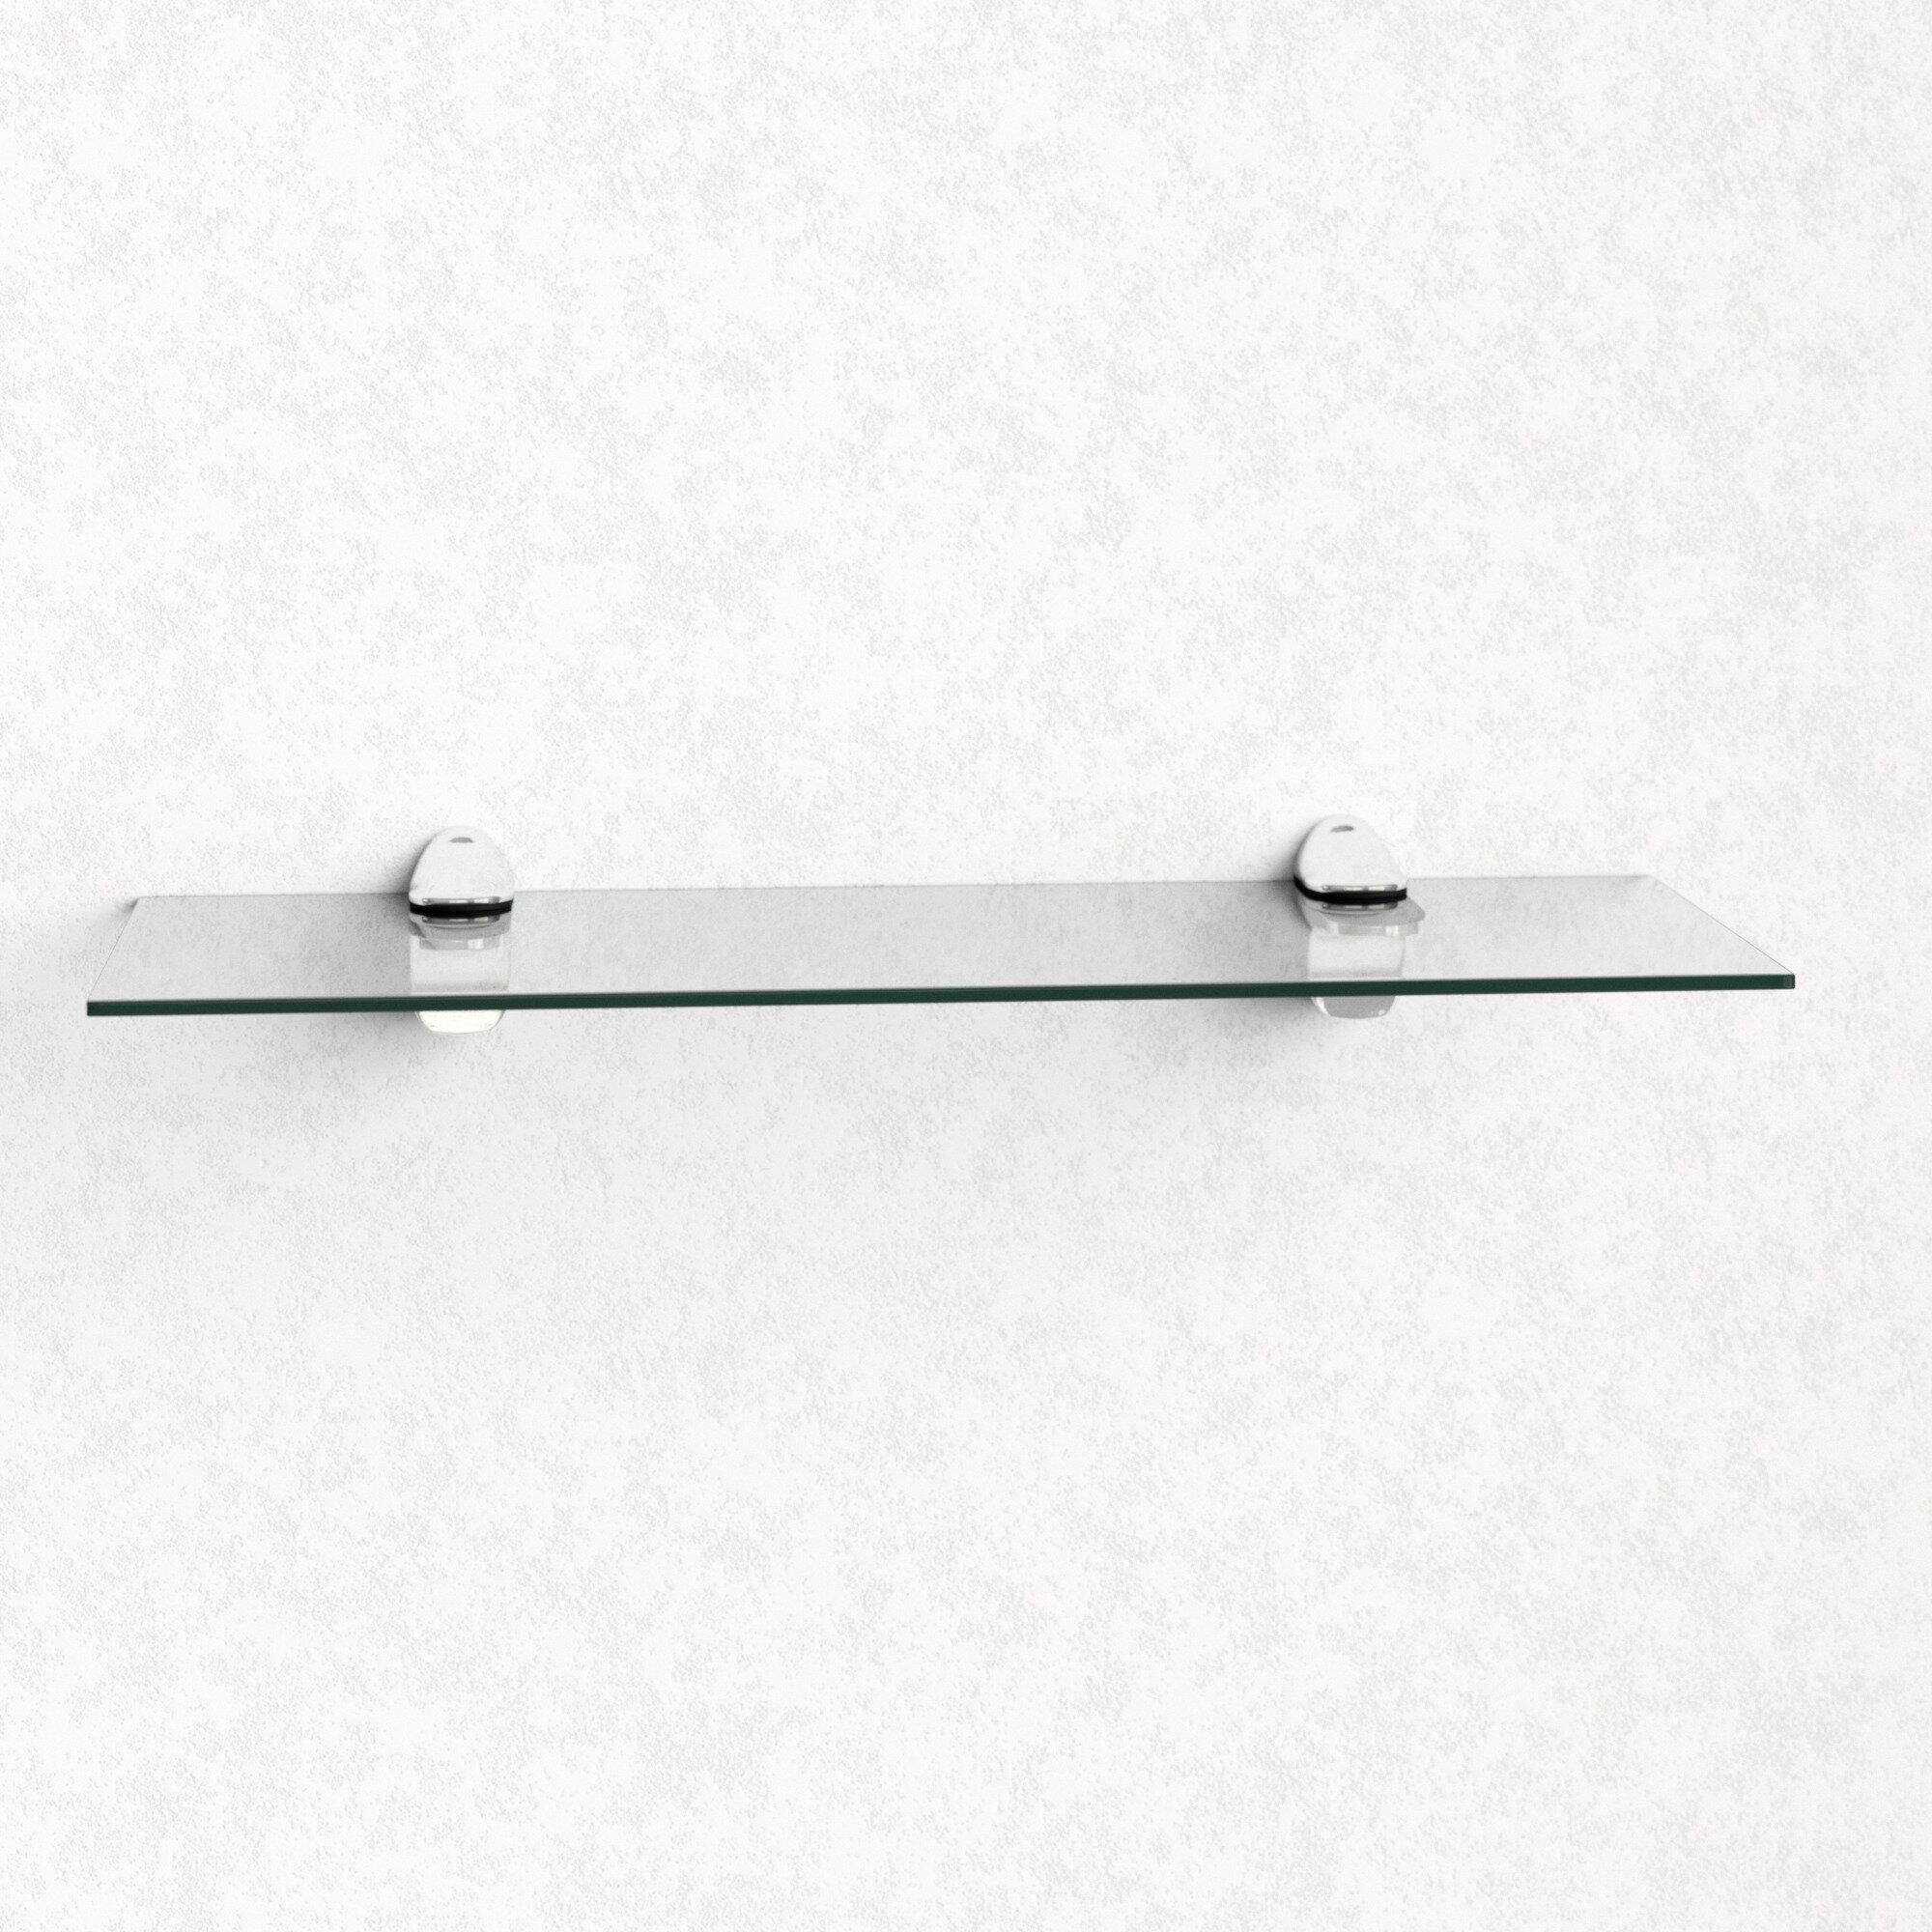 Modern Glass Floating Shelves Mirrored Wall Mounted Storage Display Shelf Home